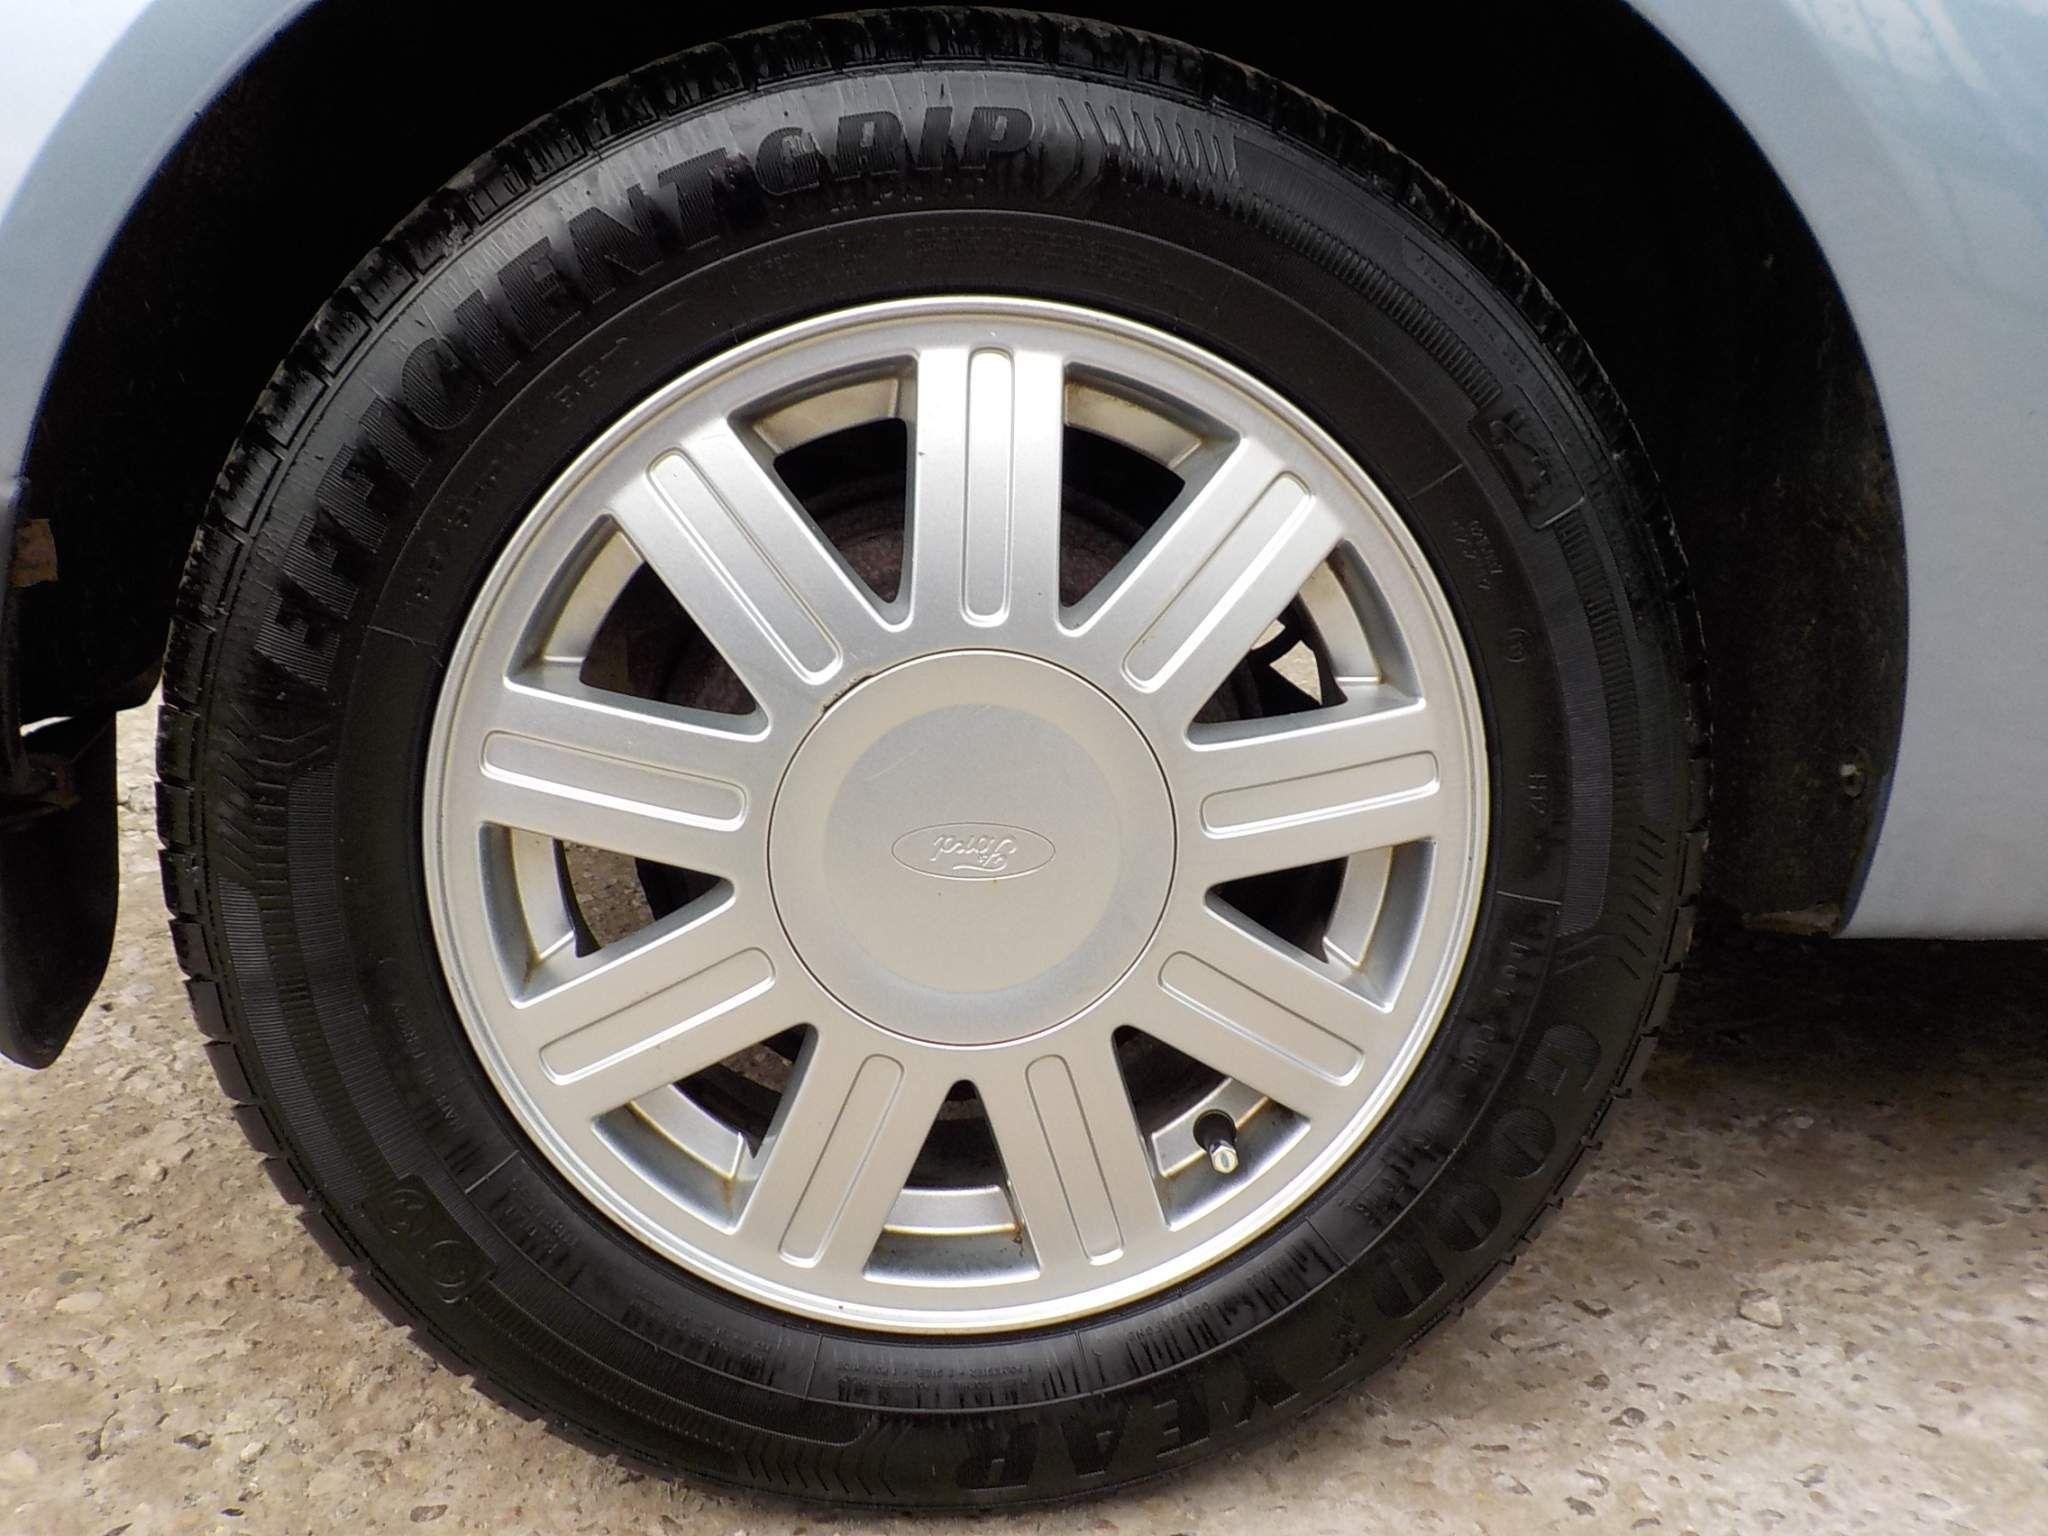 Ford Fiesta 1.4 Ghia 3dr